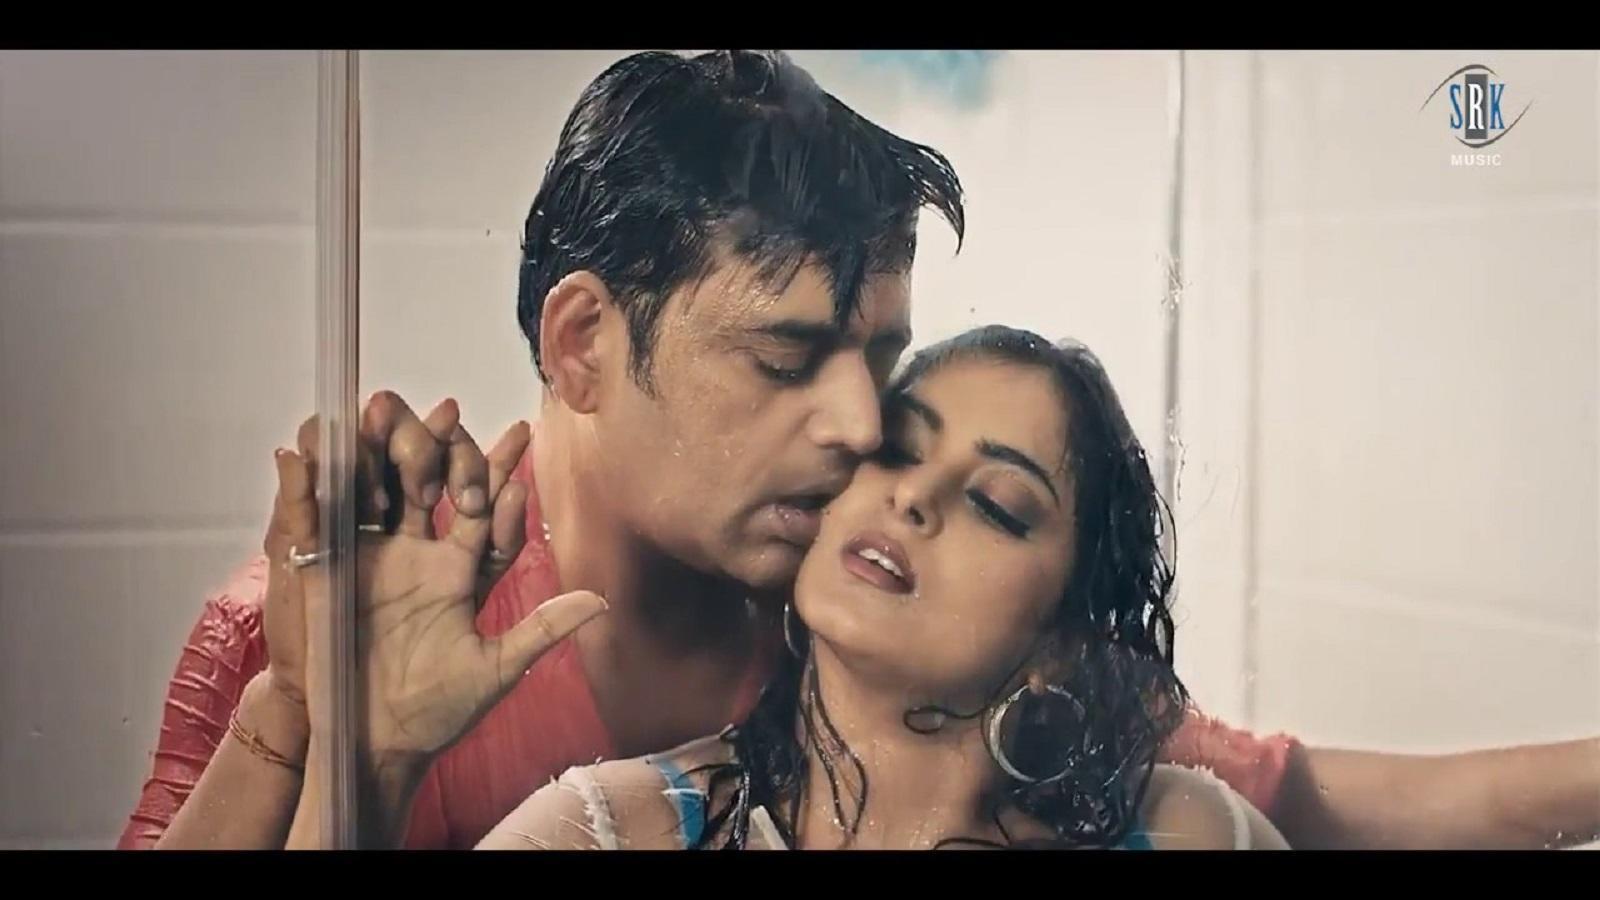 Watch: Bhojpuri song 'Lagale Tu Ang Sajna' Ft  Anjana Singh and Ravi Kishan